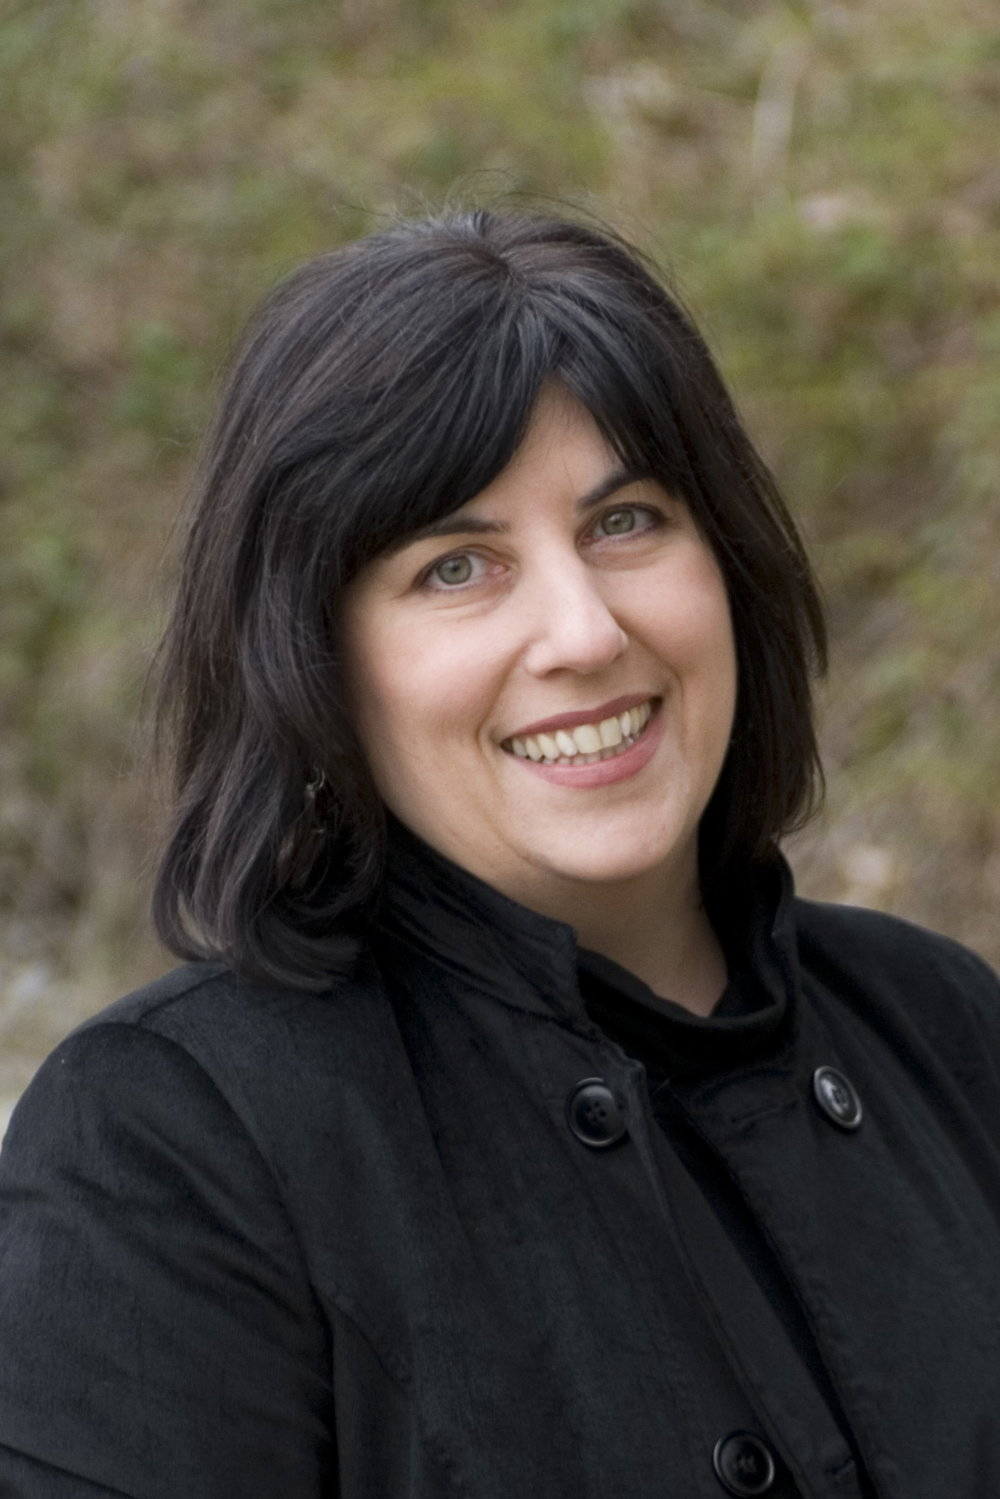 Diana Clark headshot.jpg